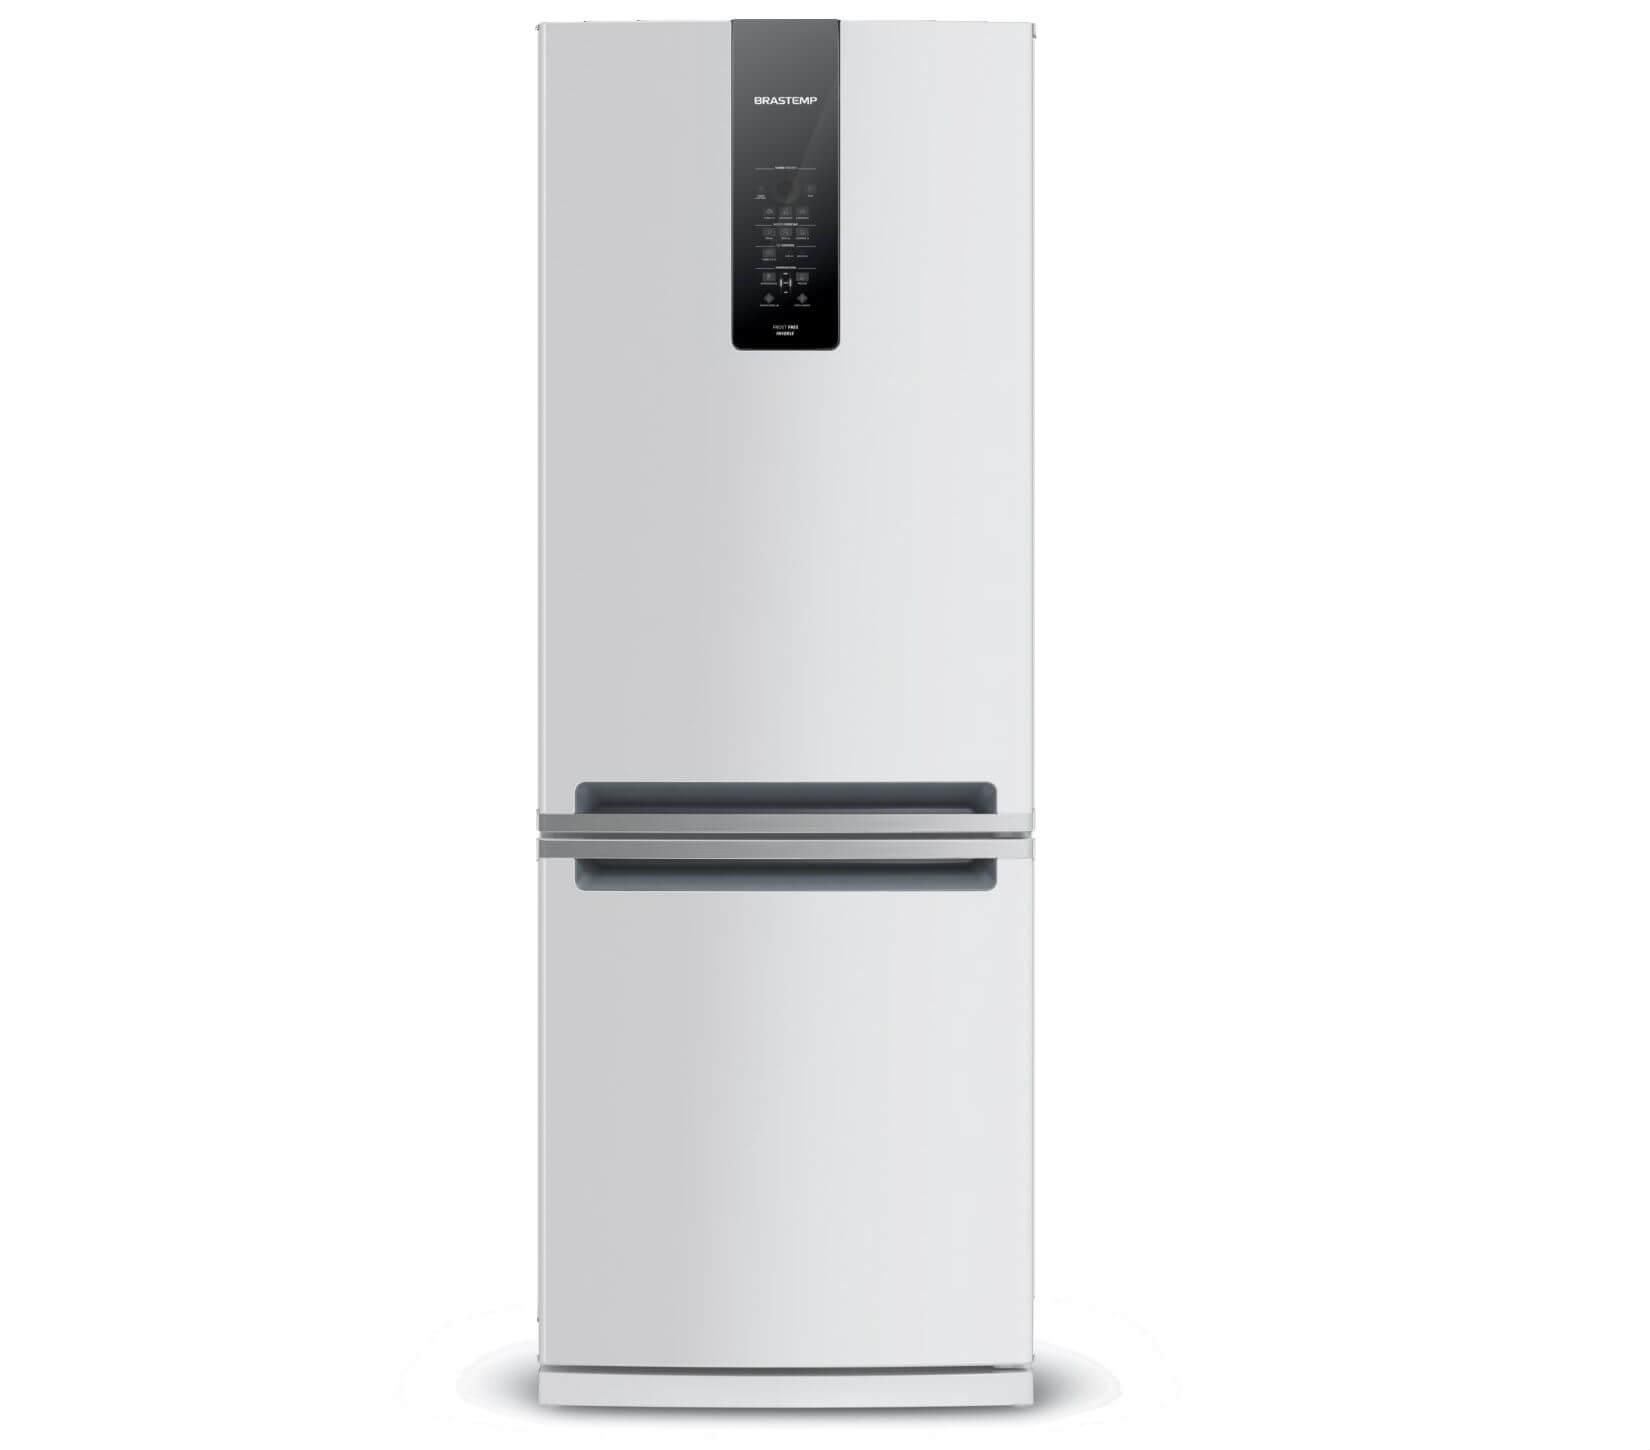 Geladeira Brastemp Frost Free Inverse 460 litros Branca com Freeze Control Advanced